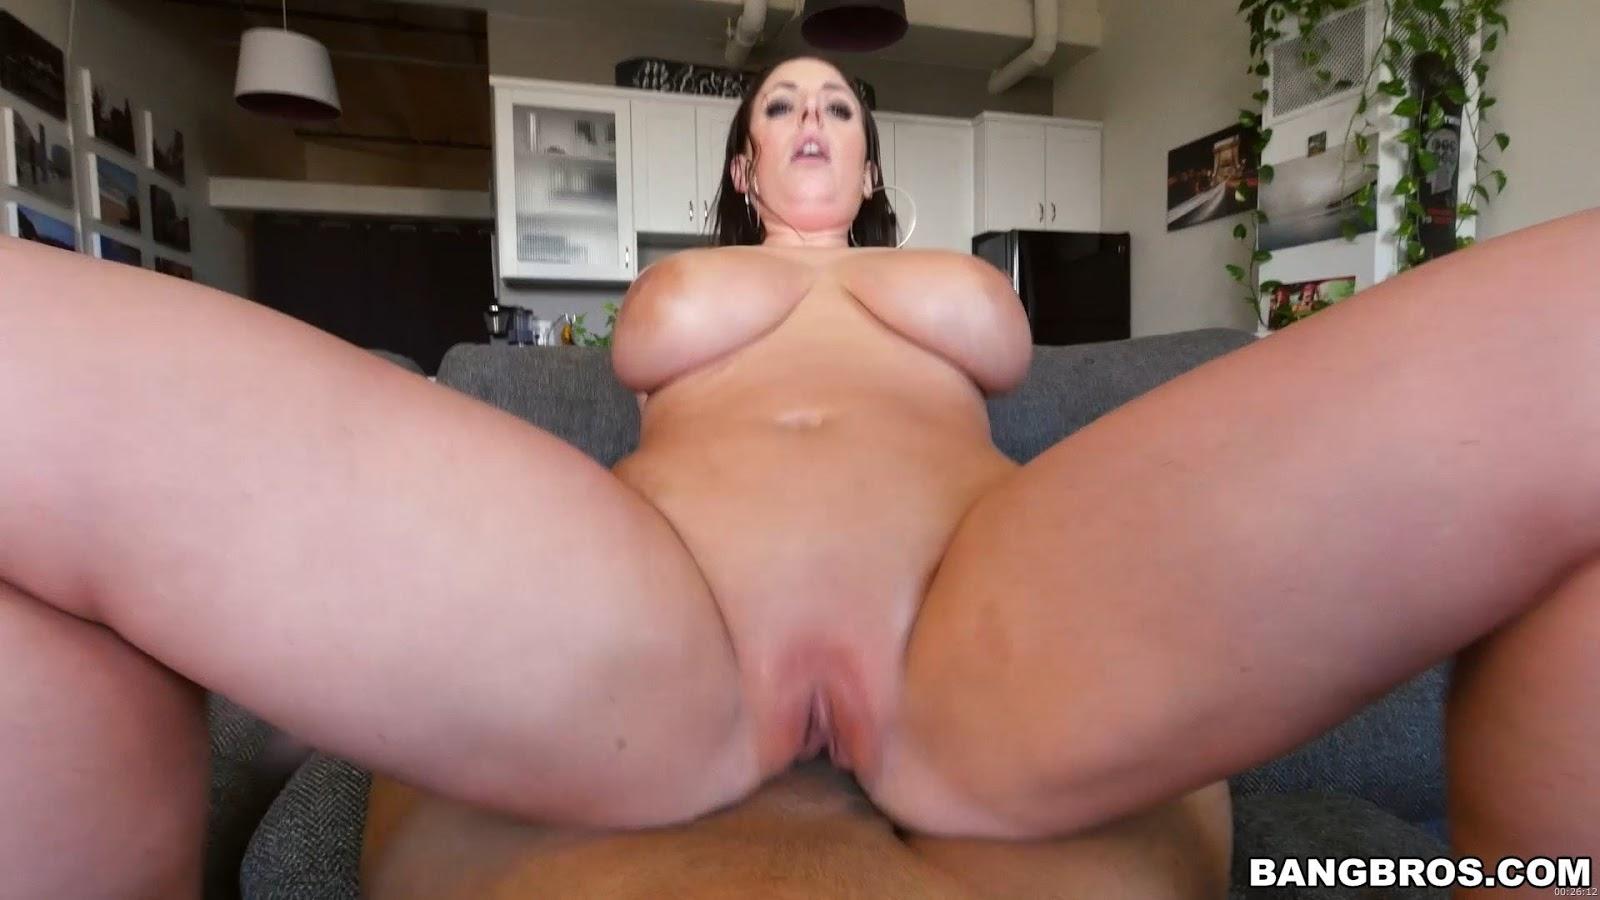 UNCENSORED [bangbros]2017-02-23 Angela White's 32 double g tits are breathtaking, AV uncensored